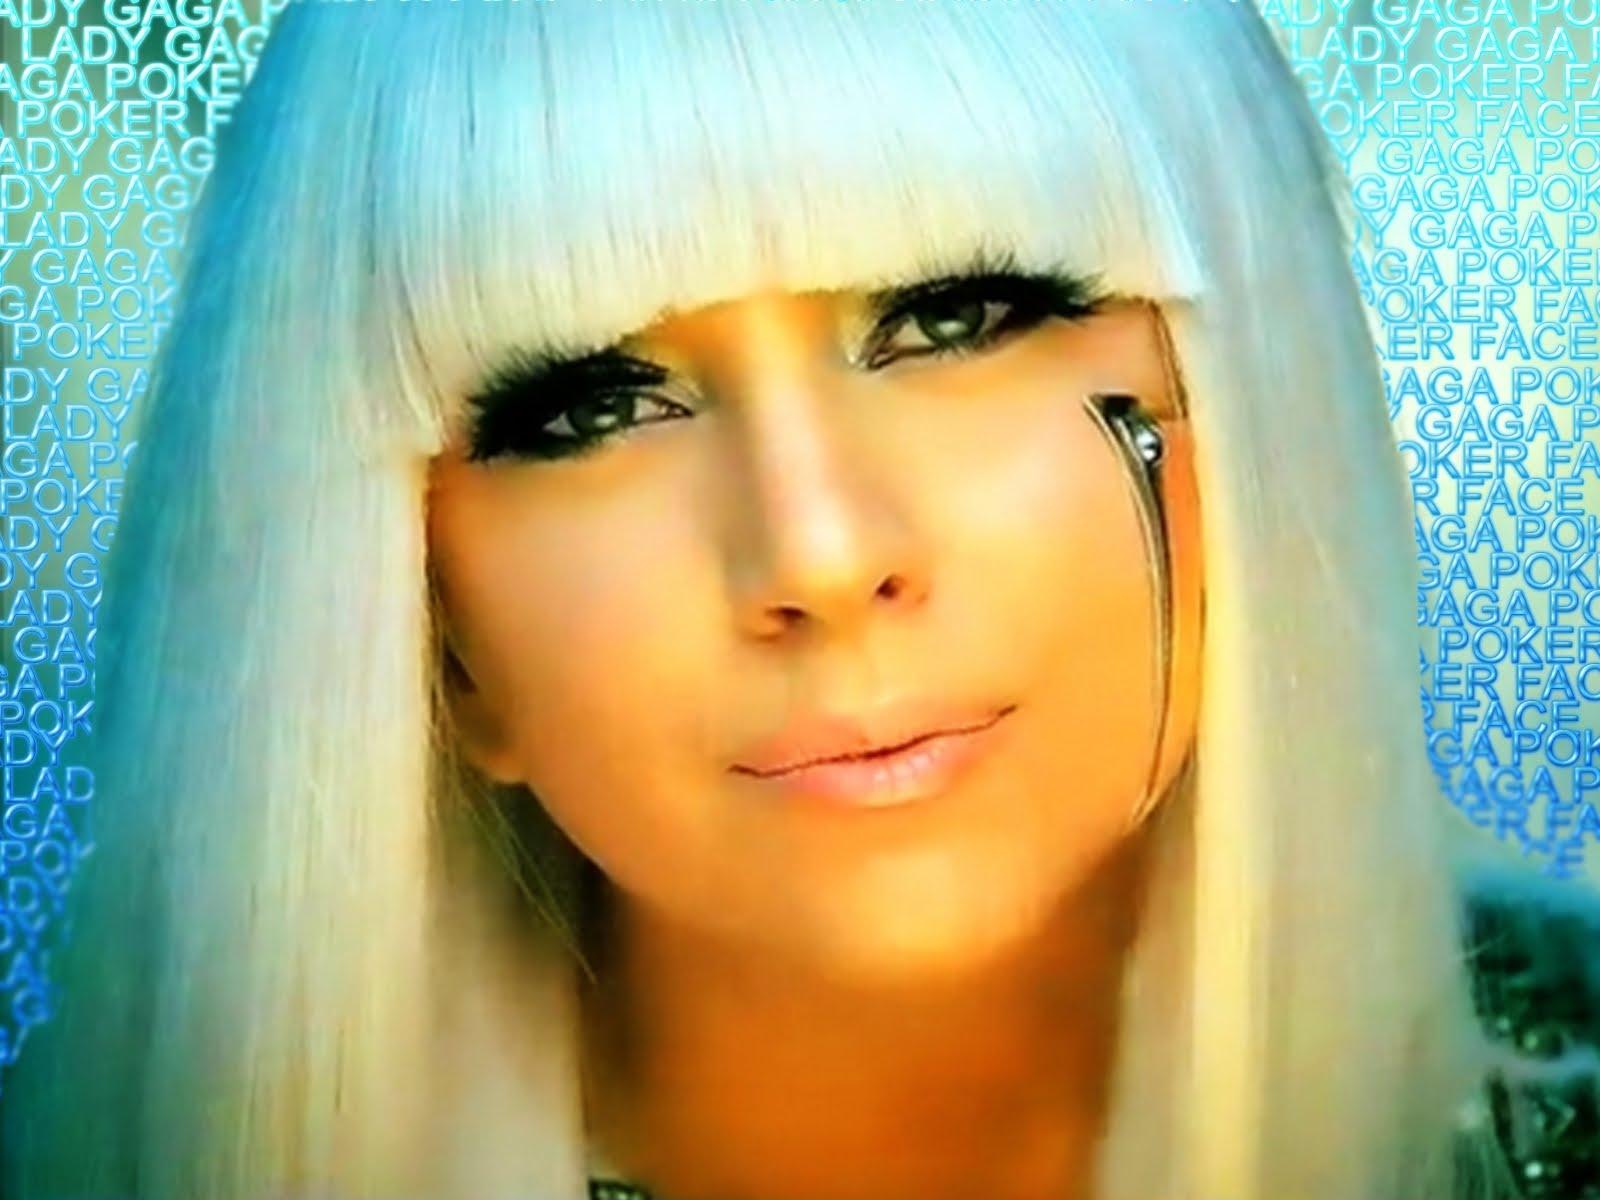 http://2.bp.blogspot.com/_wU00MU-cy4o/TDckEgX6vpI/AAAAAAAABfY/VDC54bkIsnI/s1600/Lady-GaGa-lady-gaga-3355925-1600-1200.jpg